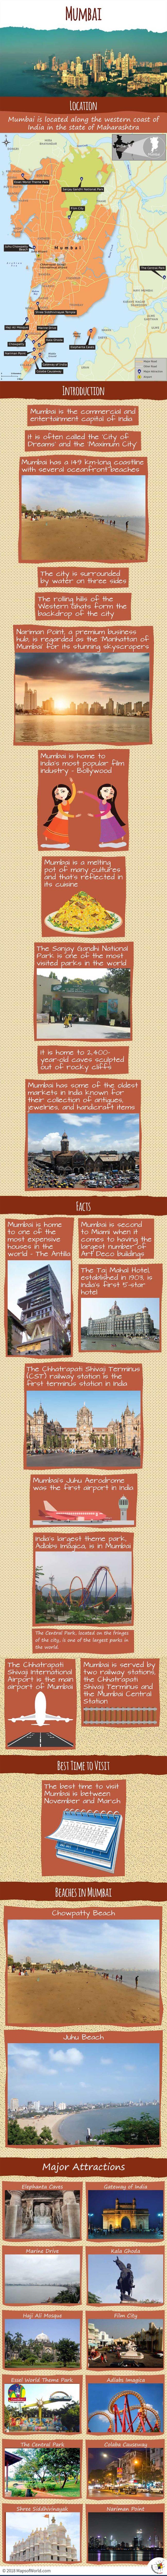 Infographic Depicting Mumbai Tourist Attractions